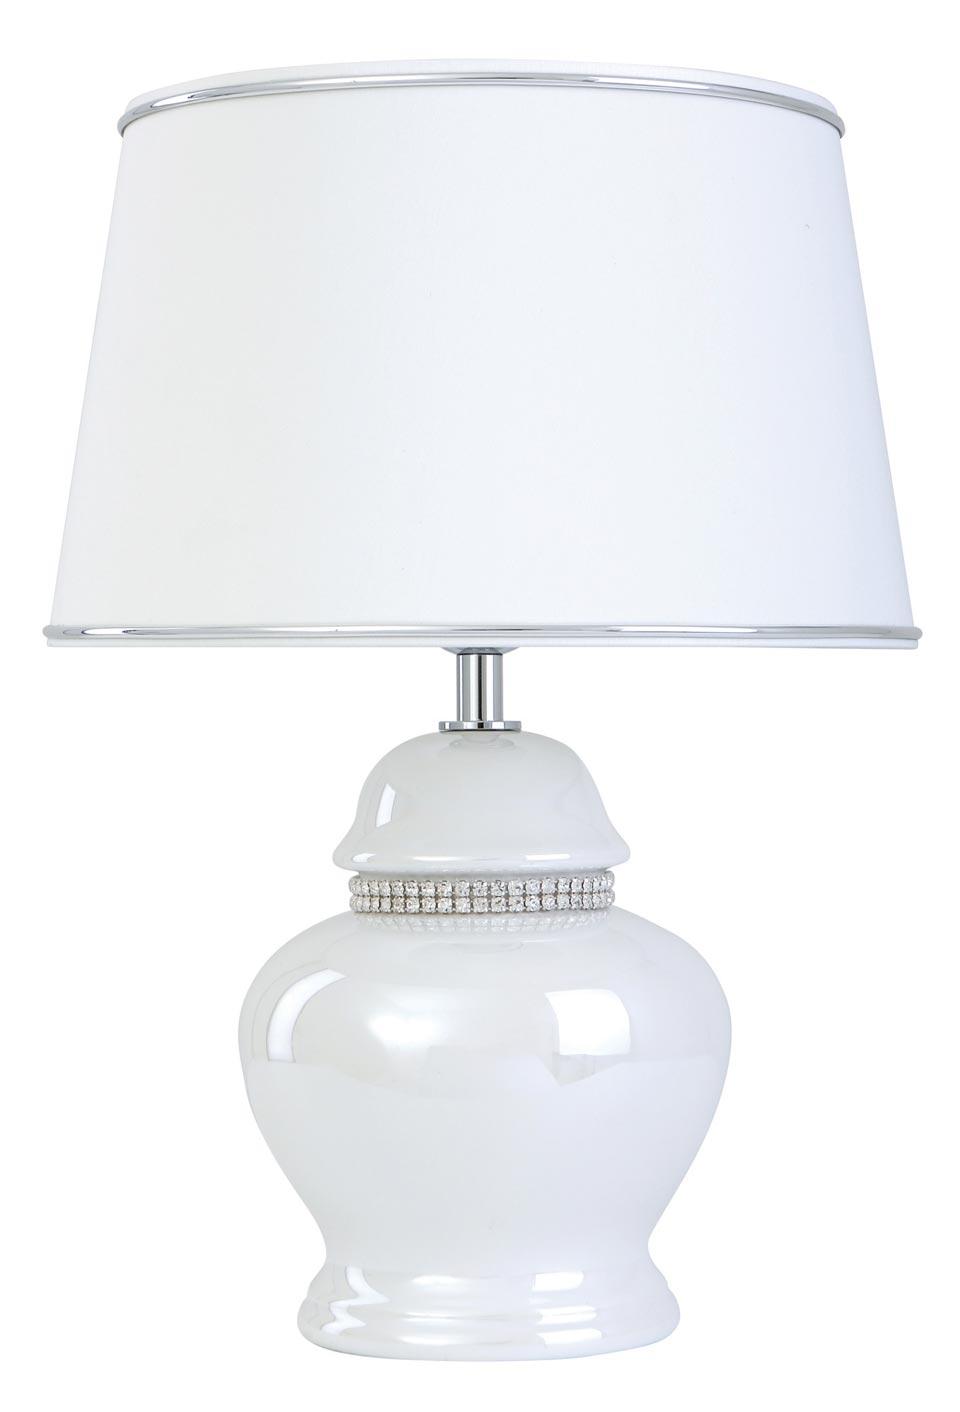 Rhinestone And Pearl White Ceramic Table Lamp Rive Le Dauphin